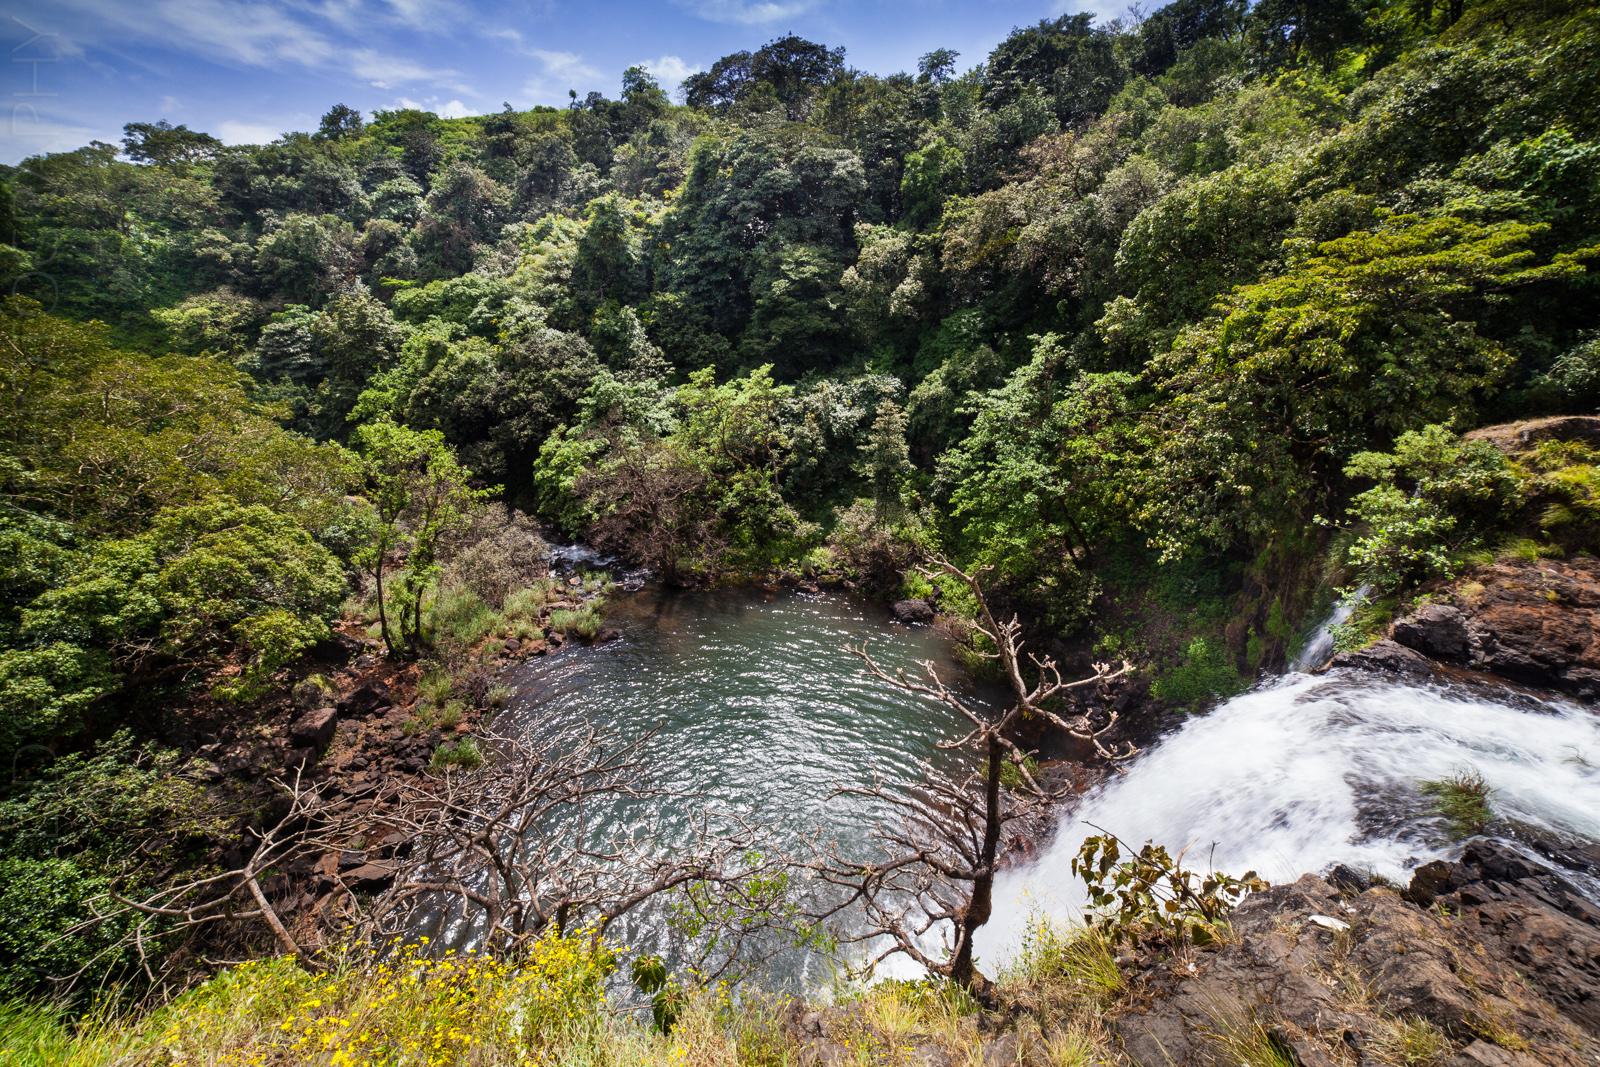 Thoseghar Waterfalls, Maharashtra